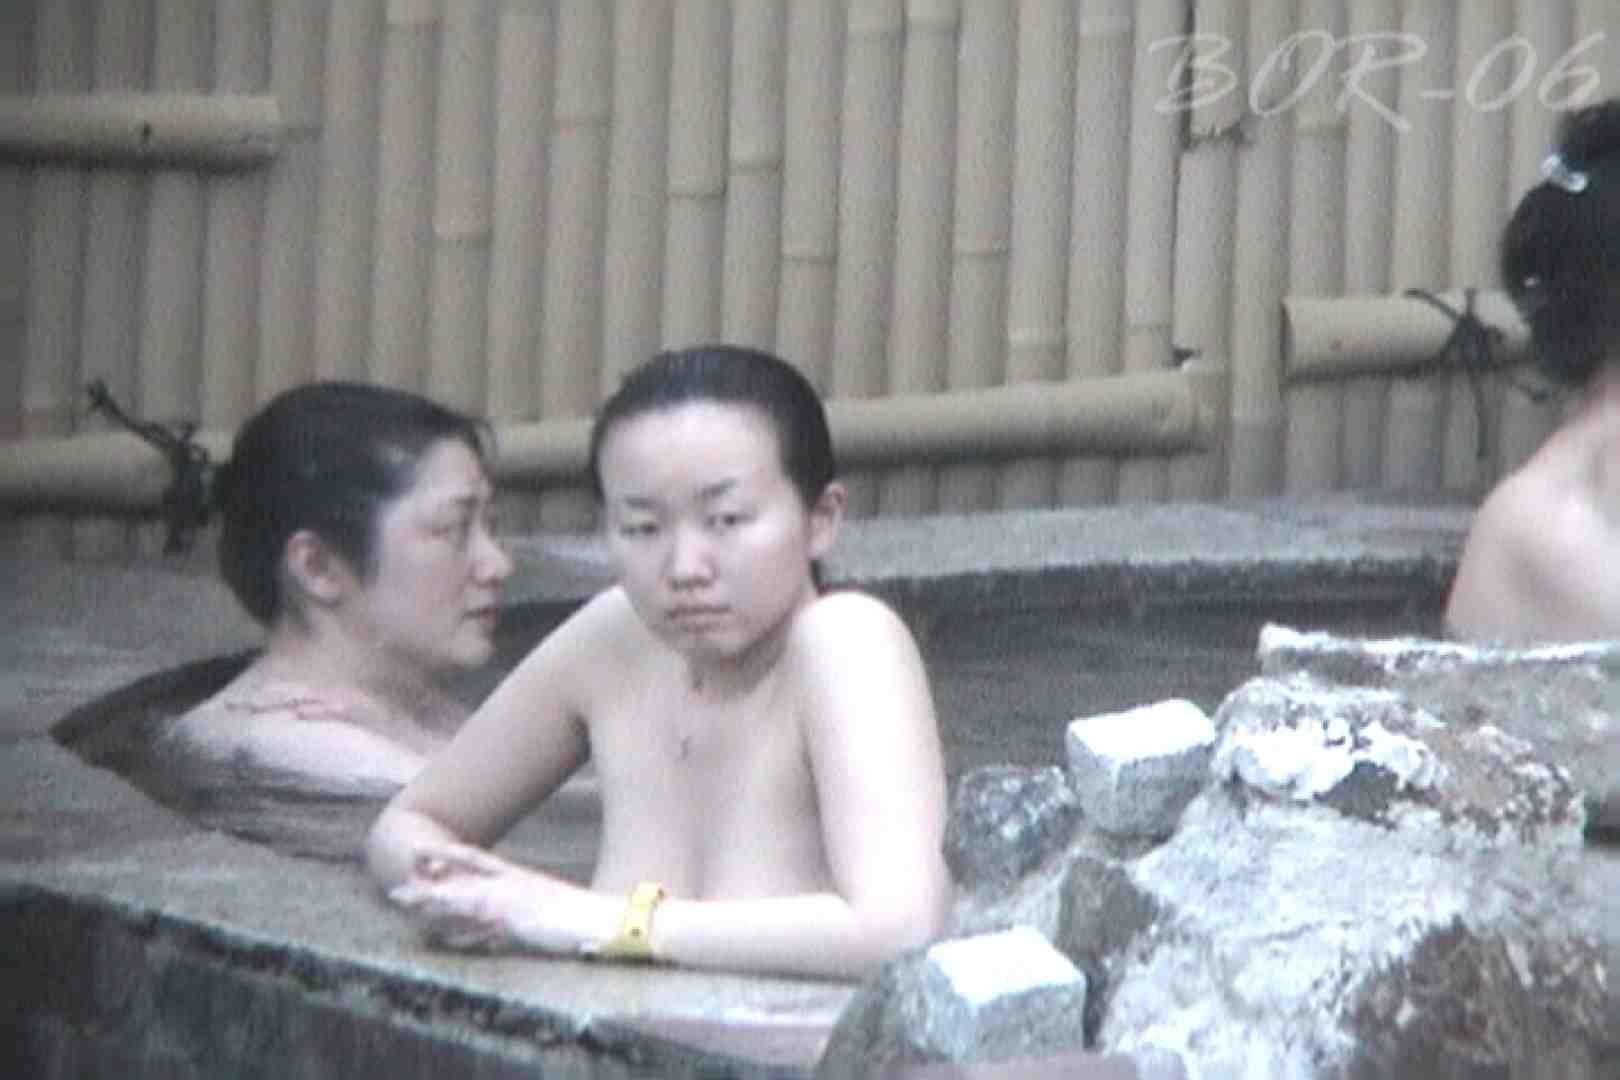 Aquaな露天風呂Vol.519 HなOL   盗撮  86pic 1